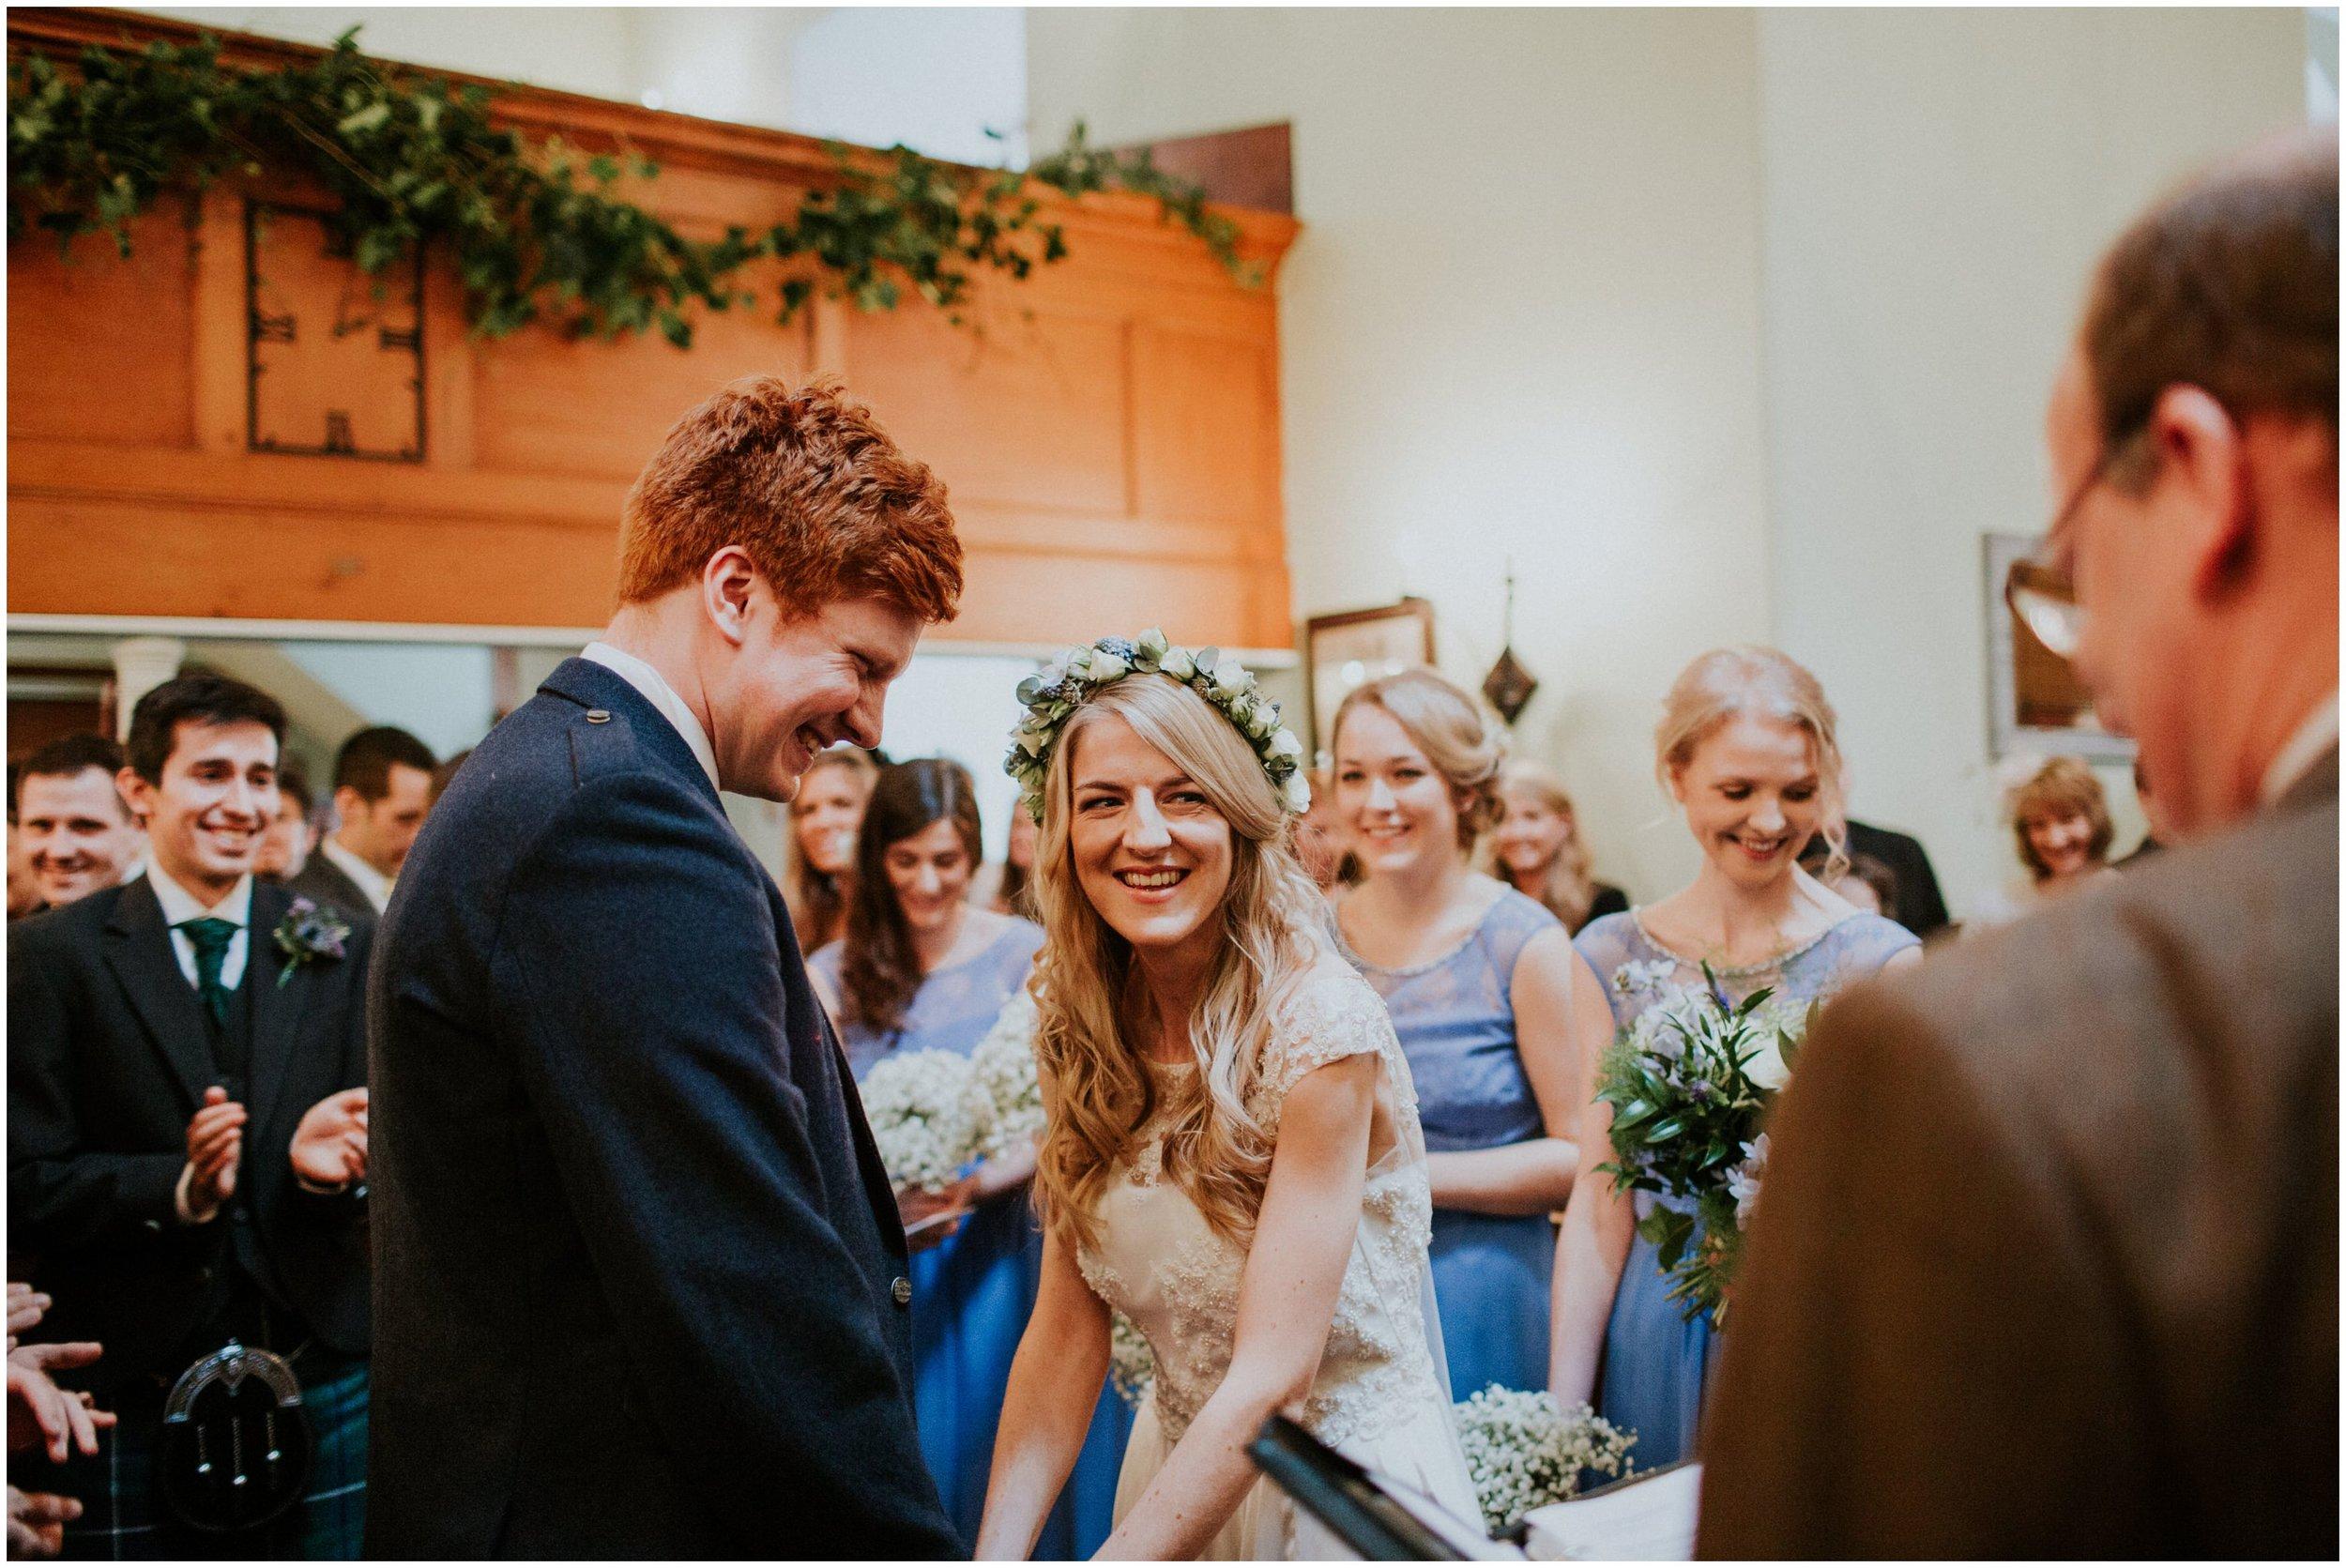 Photography 78 - Glasgow Wedding Photographer - Dave & Alana_0037.jpg